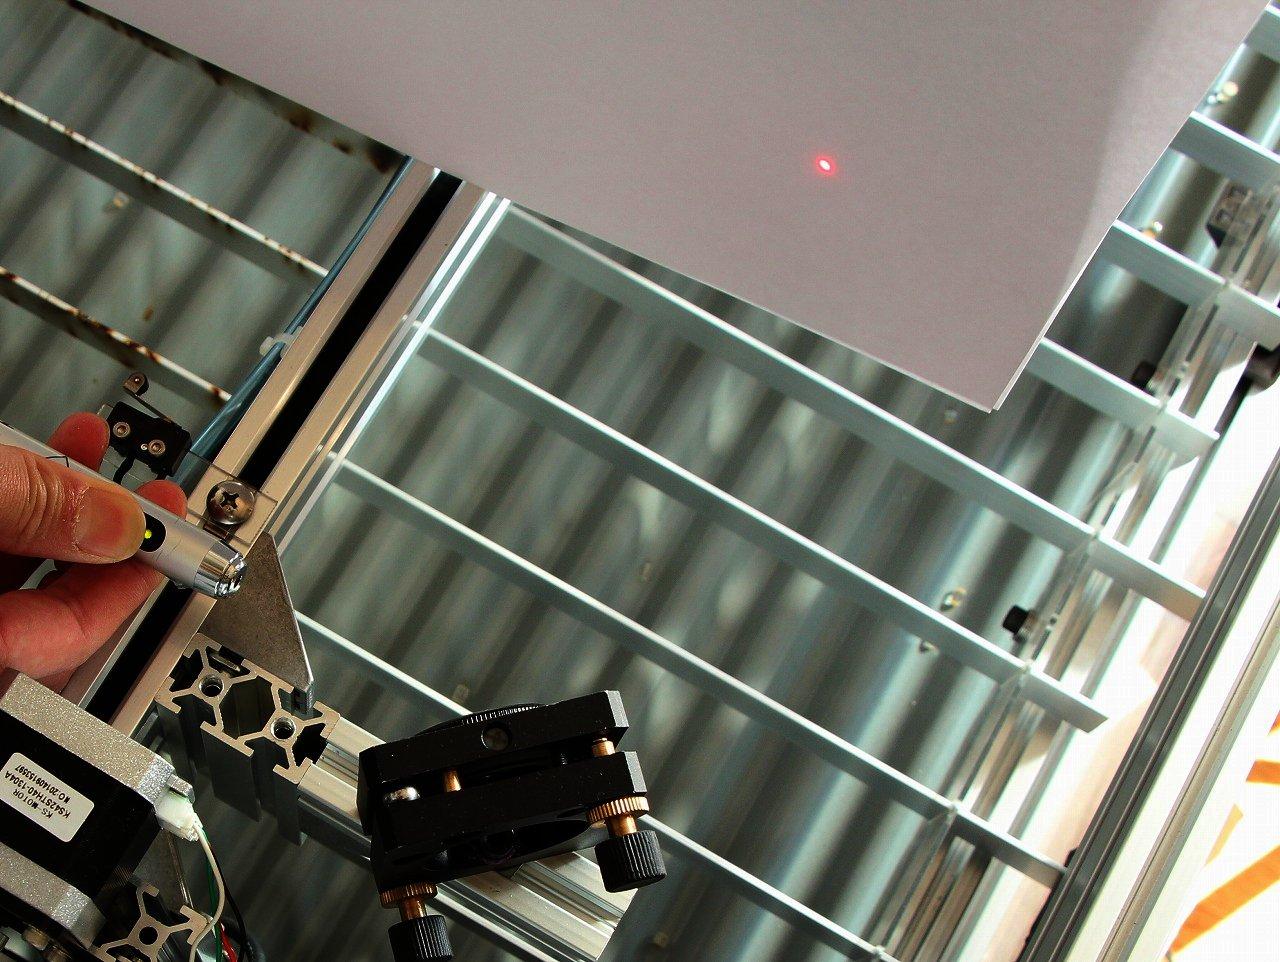 CO2レーザー加工機(カッター) 構造編 ミラー レンズの画像